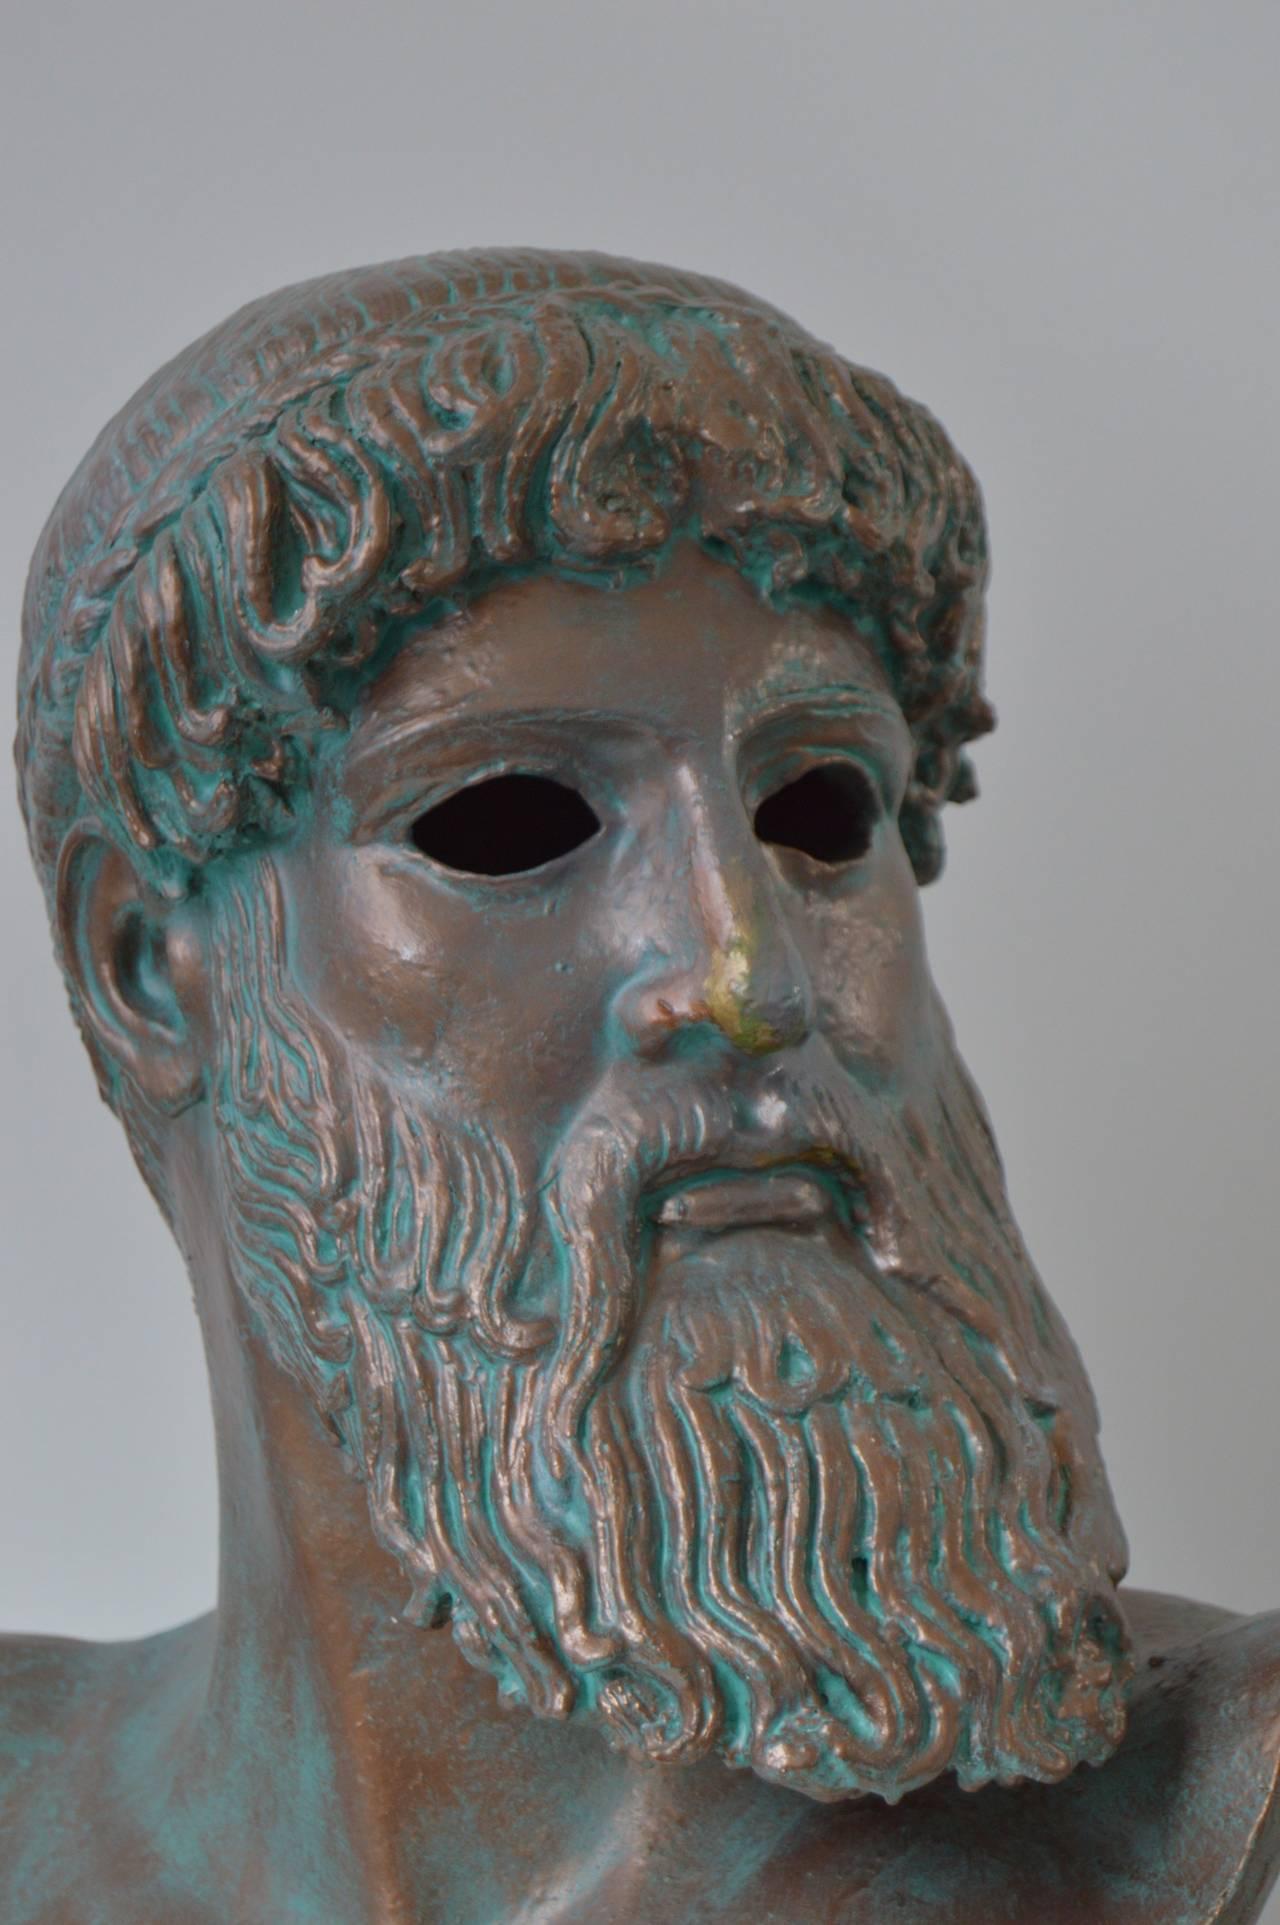 Illuminated Bust of Promethius